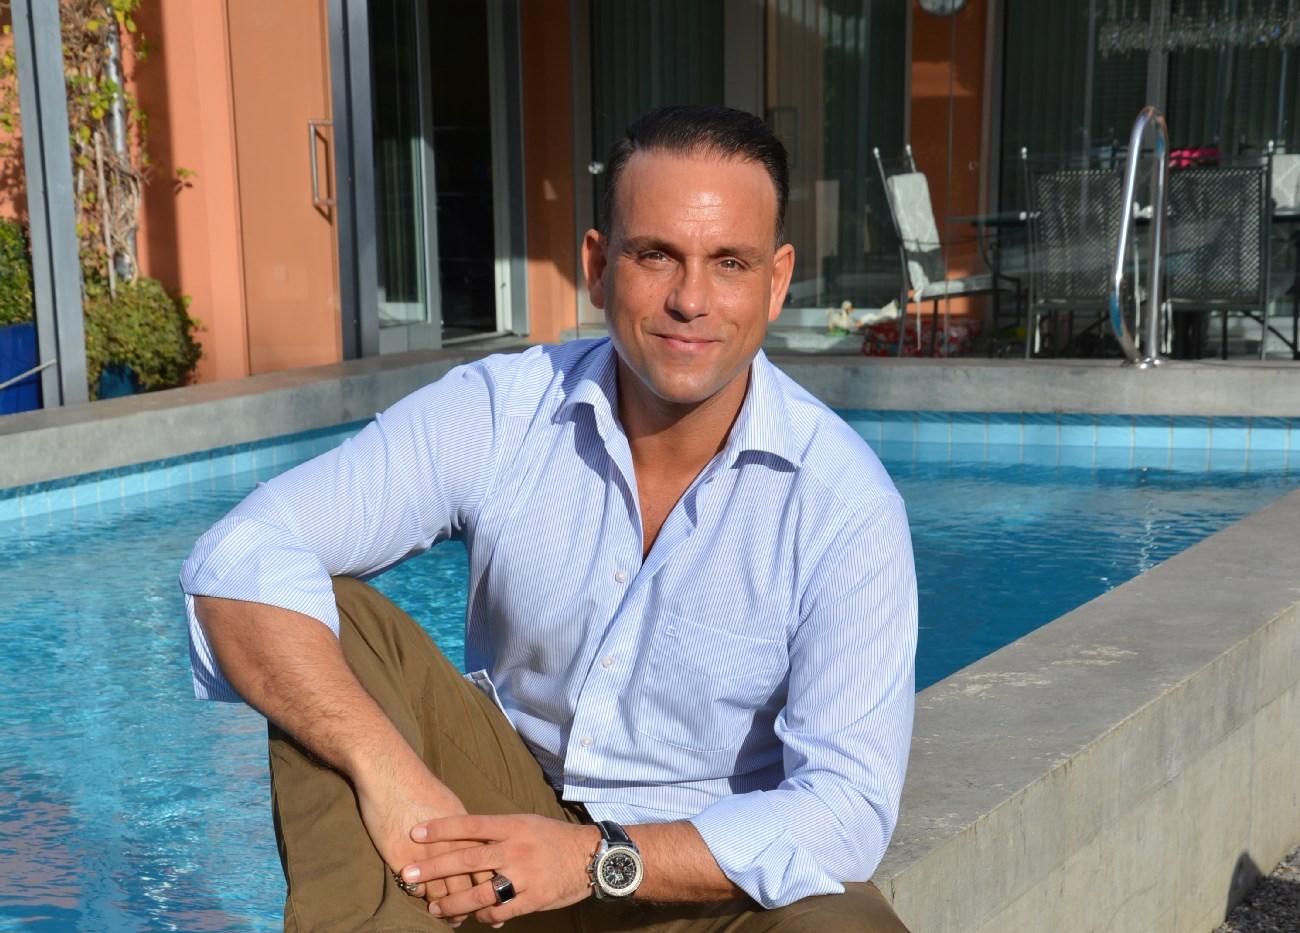 Adel Abdel Latif